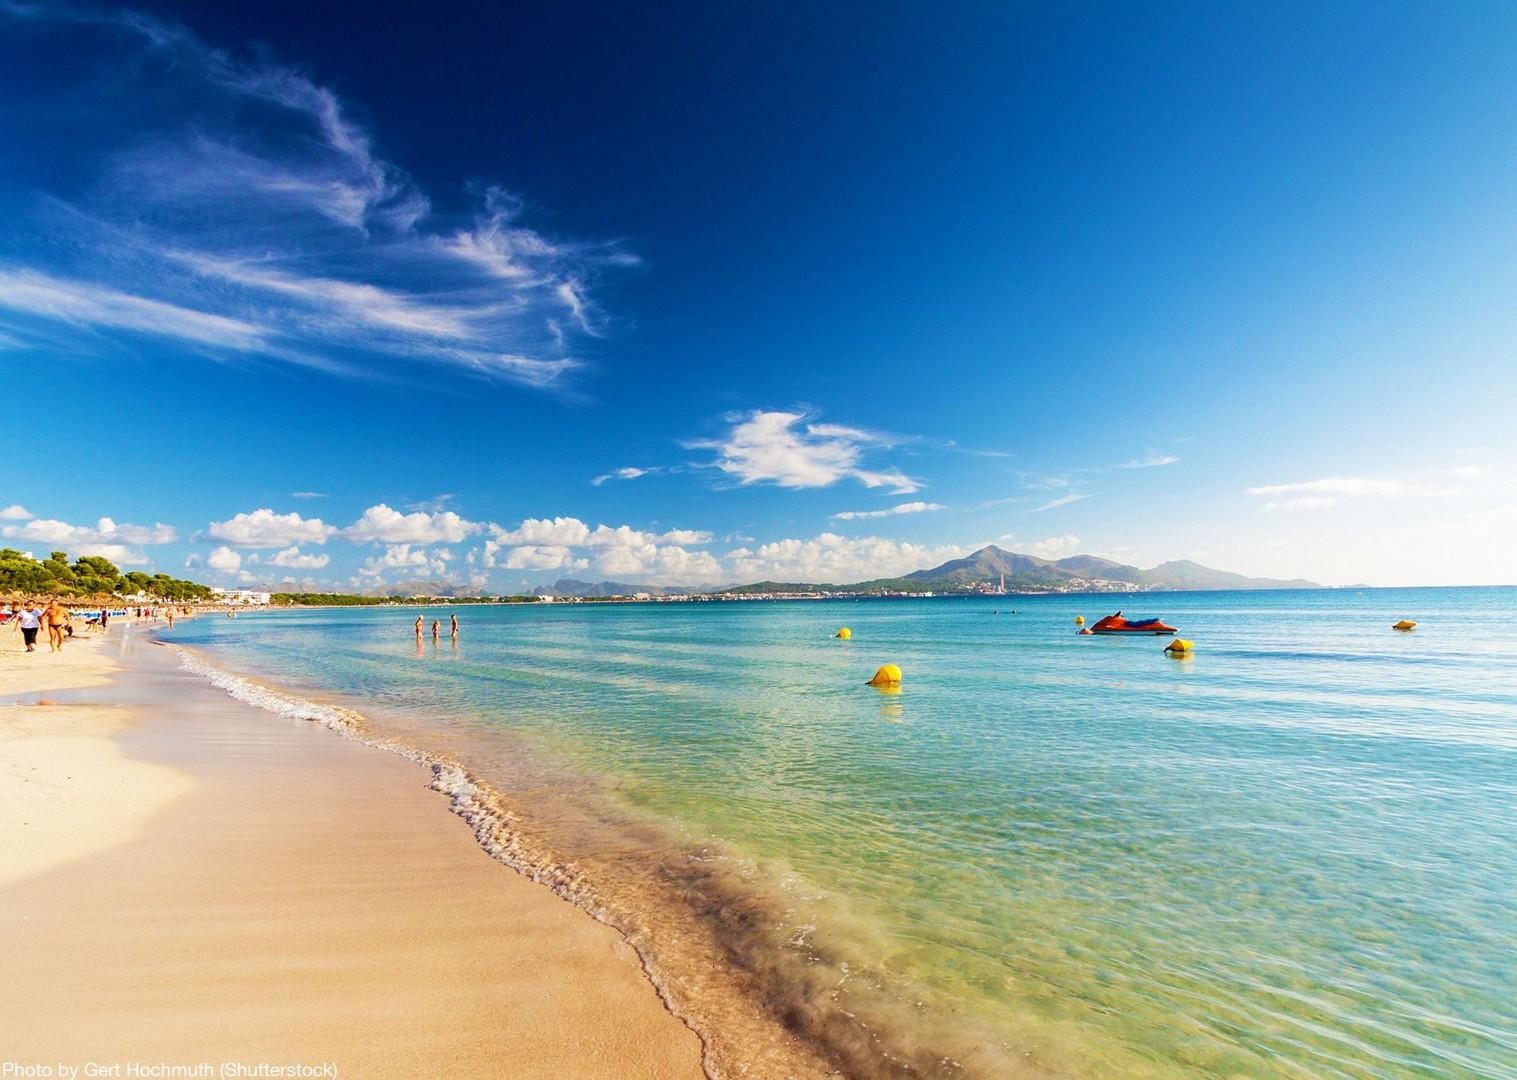 watersports-sea-mallorca-island-fun-beaches-bike-holiday-playa-st-vincent.jpg - Spain - Mallorca - Self-Guided Leisure Cycling Holiday - Leisure Cycling